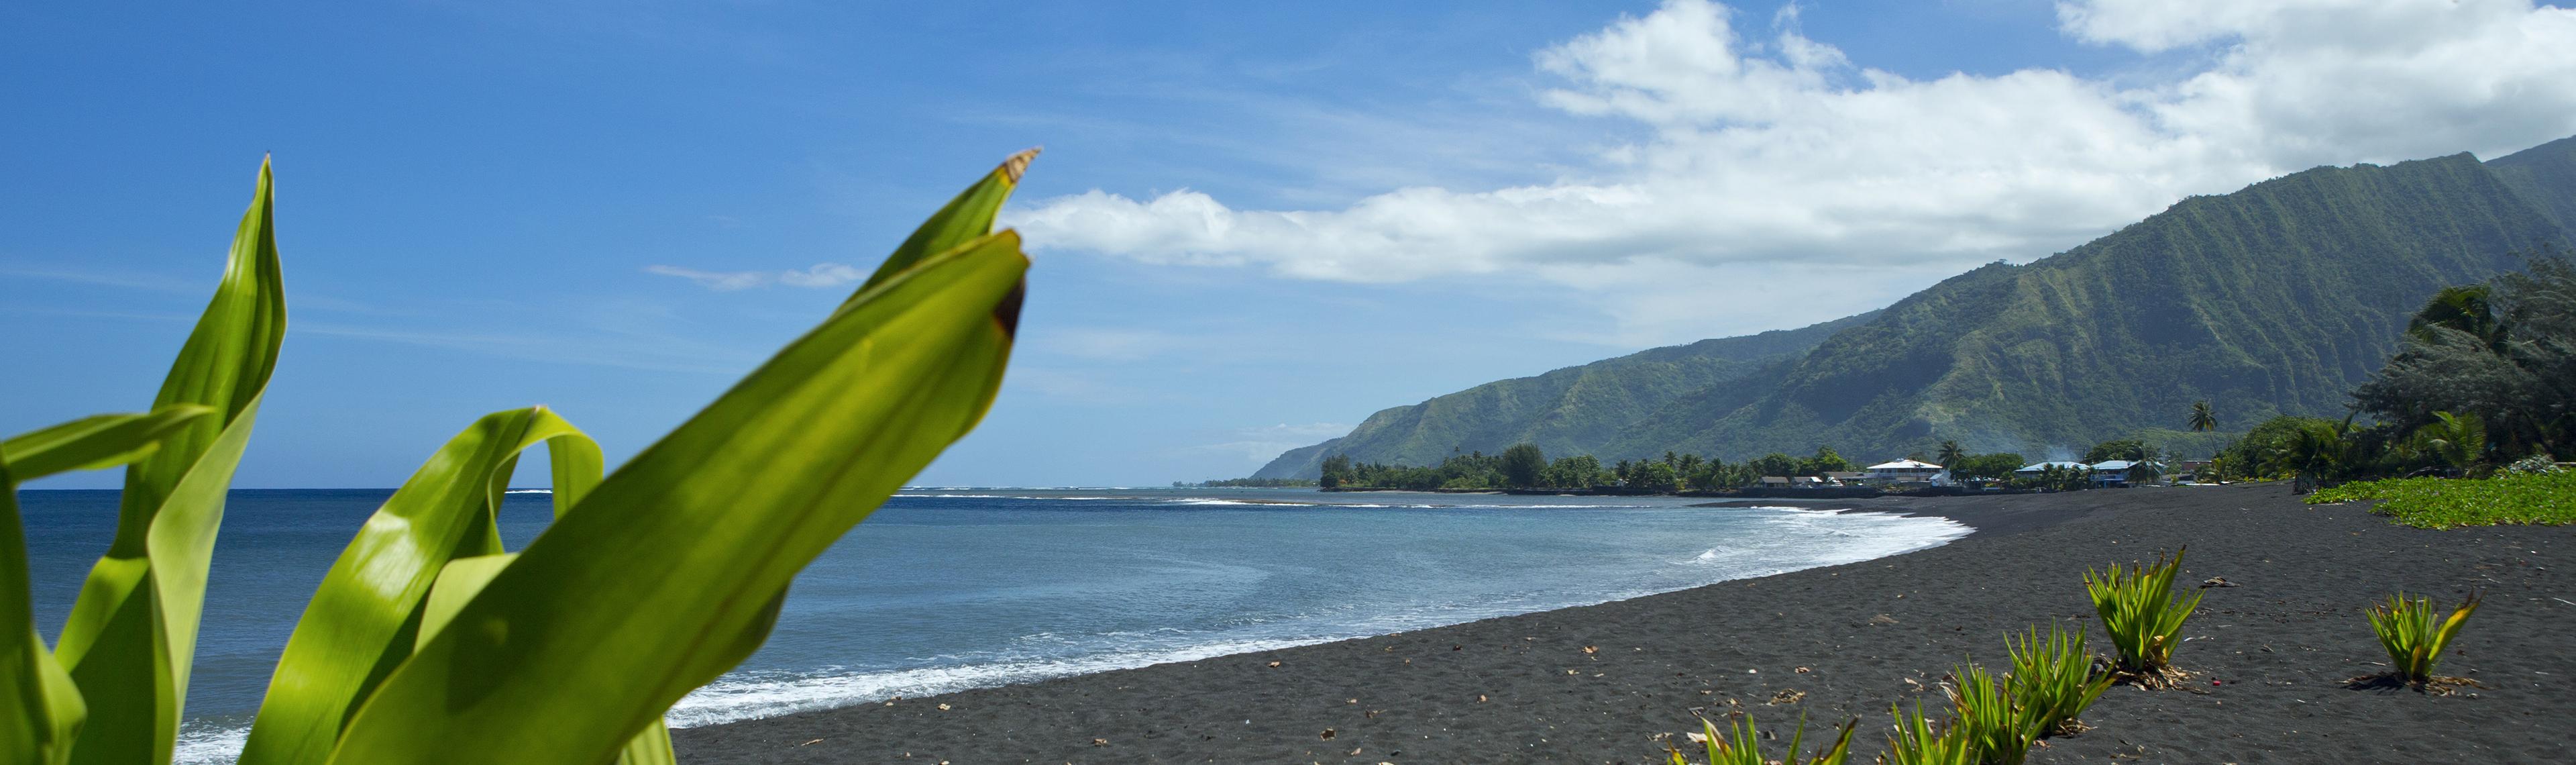 Tahiti island